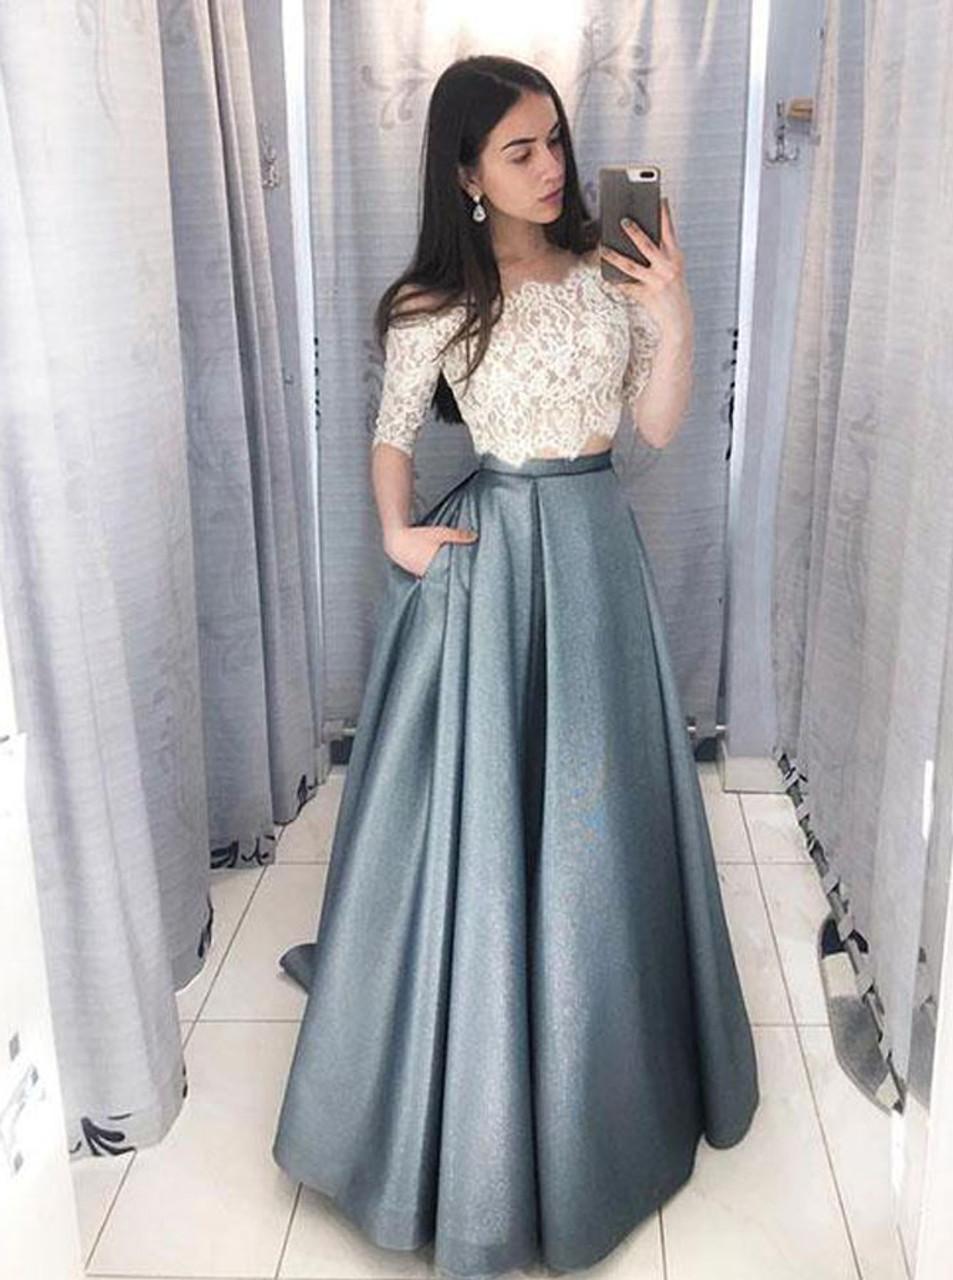 two piece prom dresses,prom dress 2 piece,two piece prom dresses,a line prom dresses,